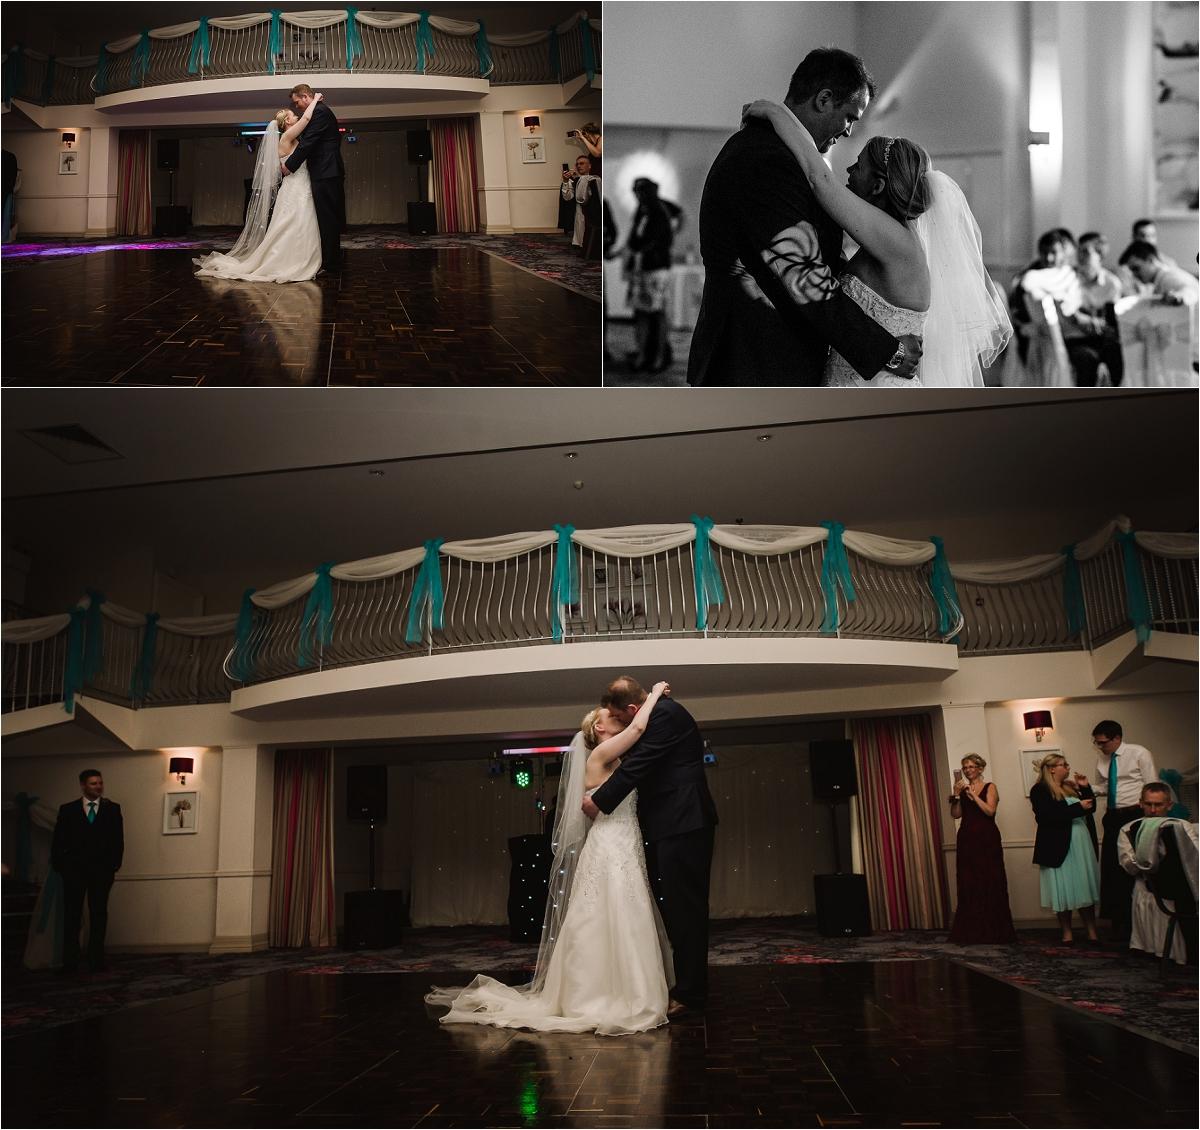 dan_emma_wedding_0075.jpg